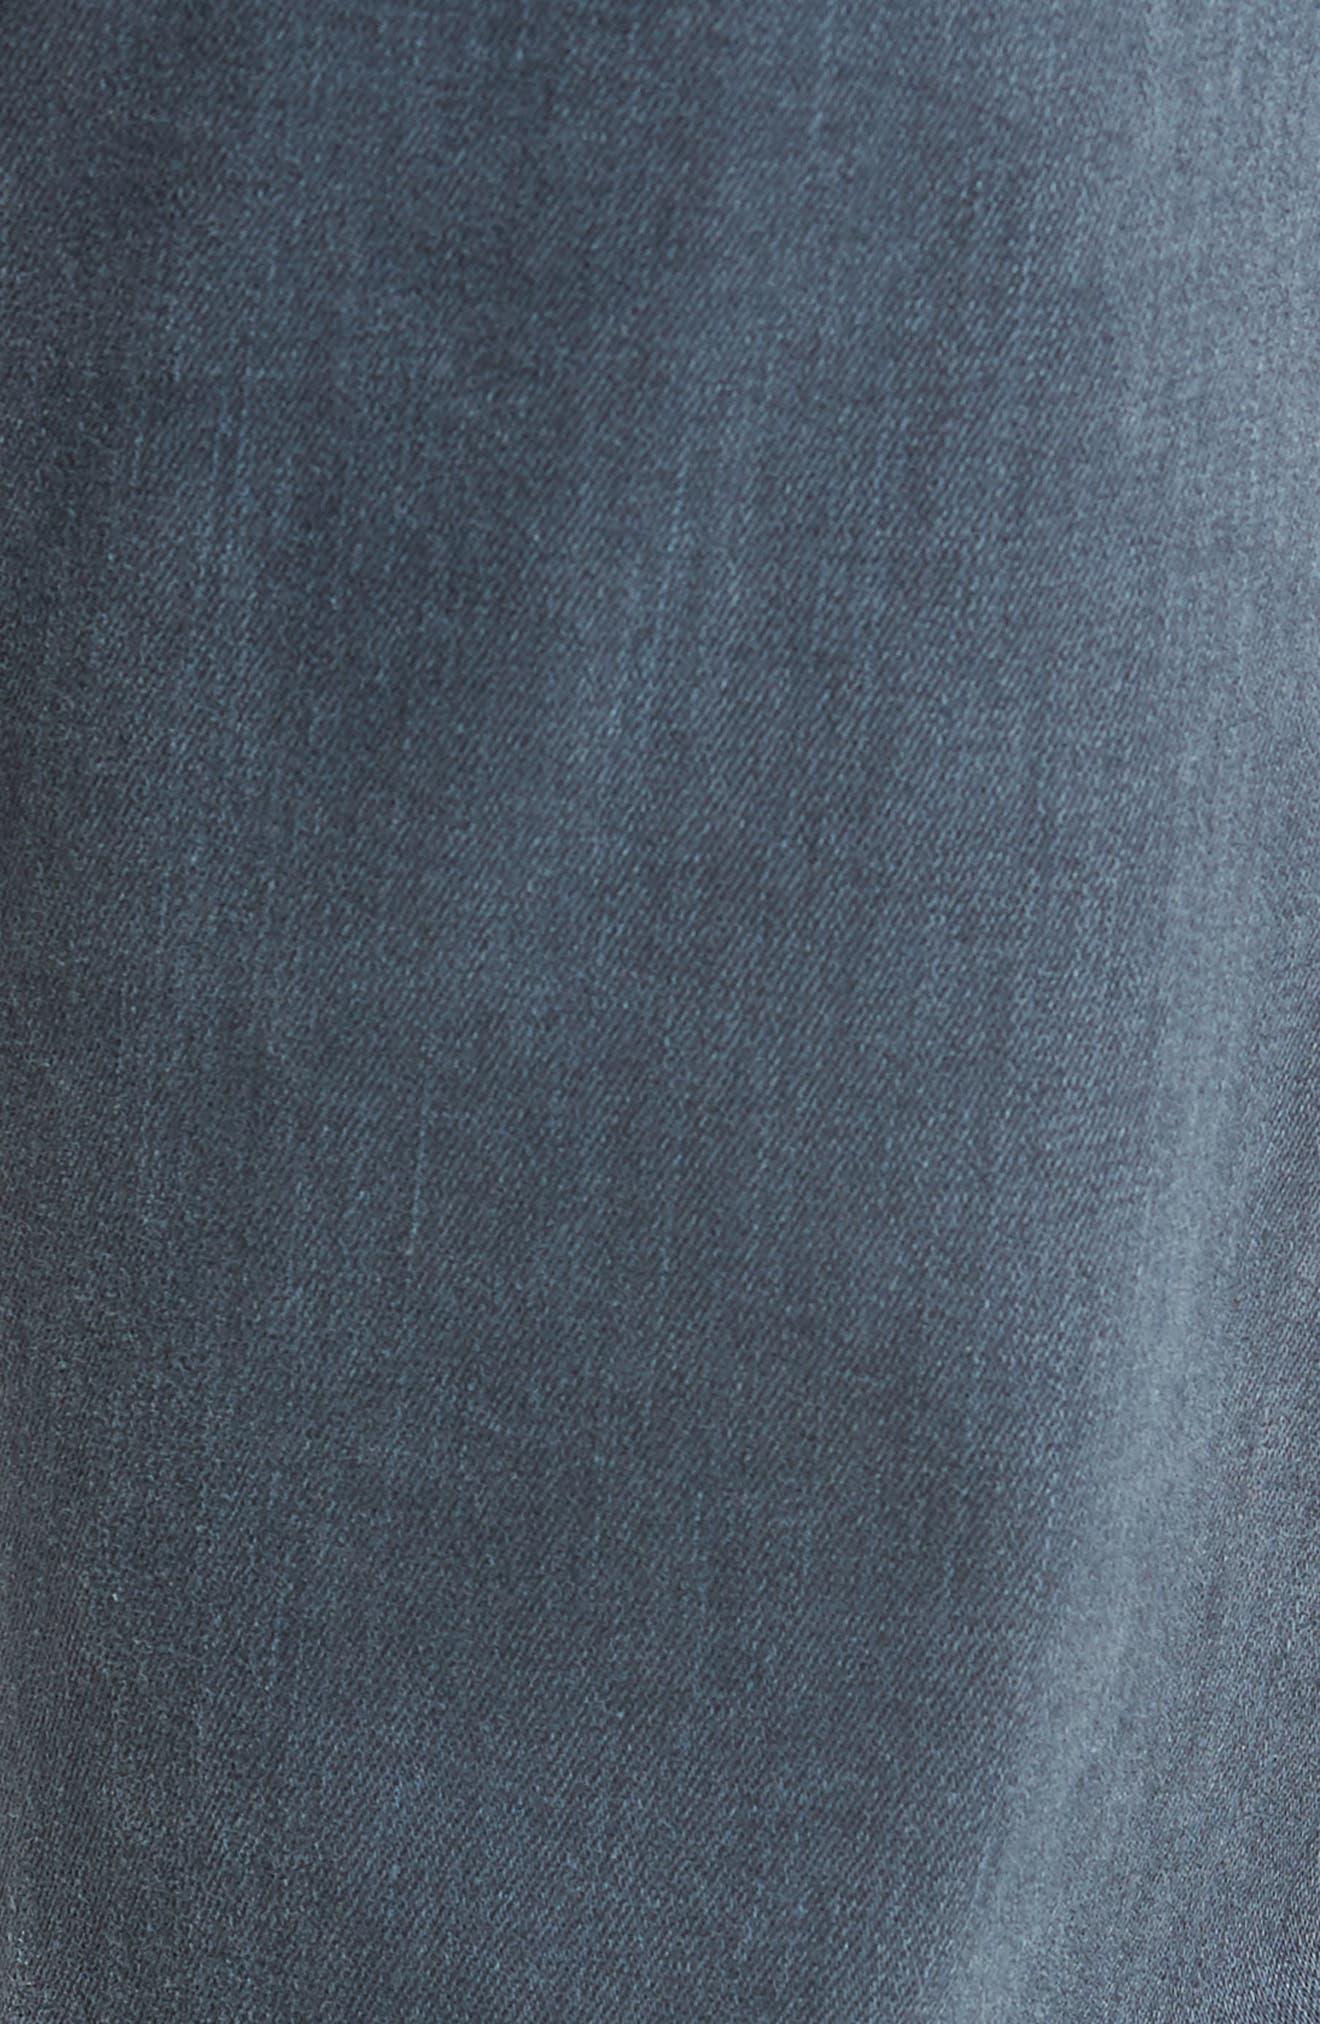 Gage Slim Straight Leg Jeans,                             Alternate thumbnail 5, color,                             SORRENTO